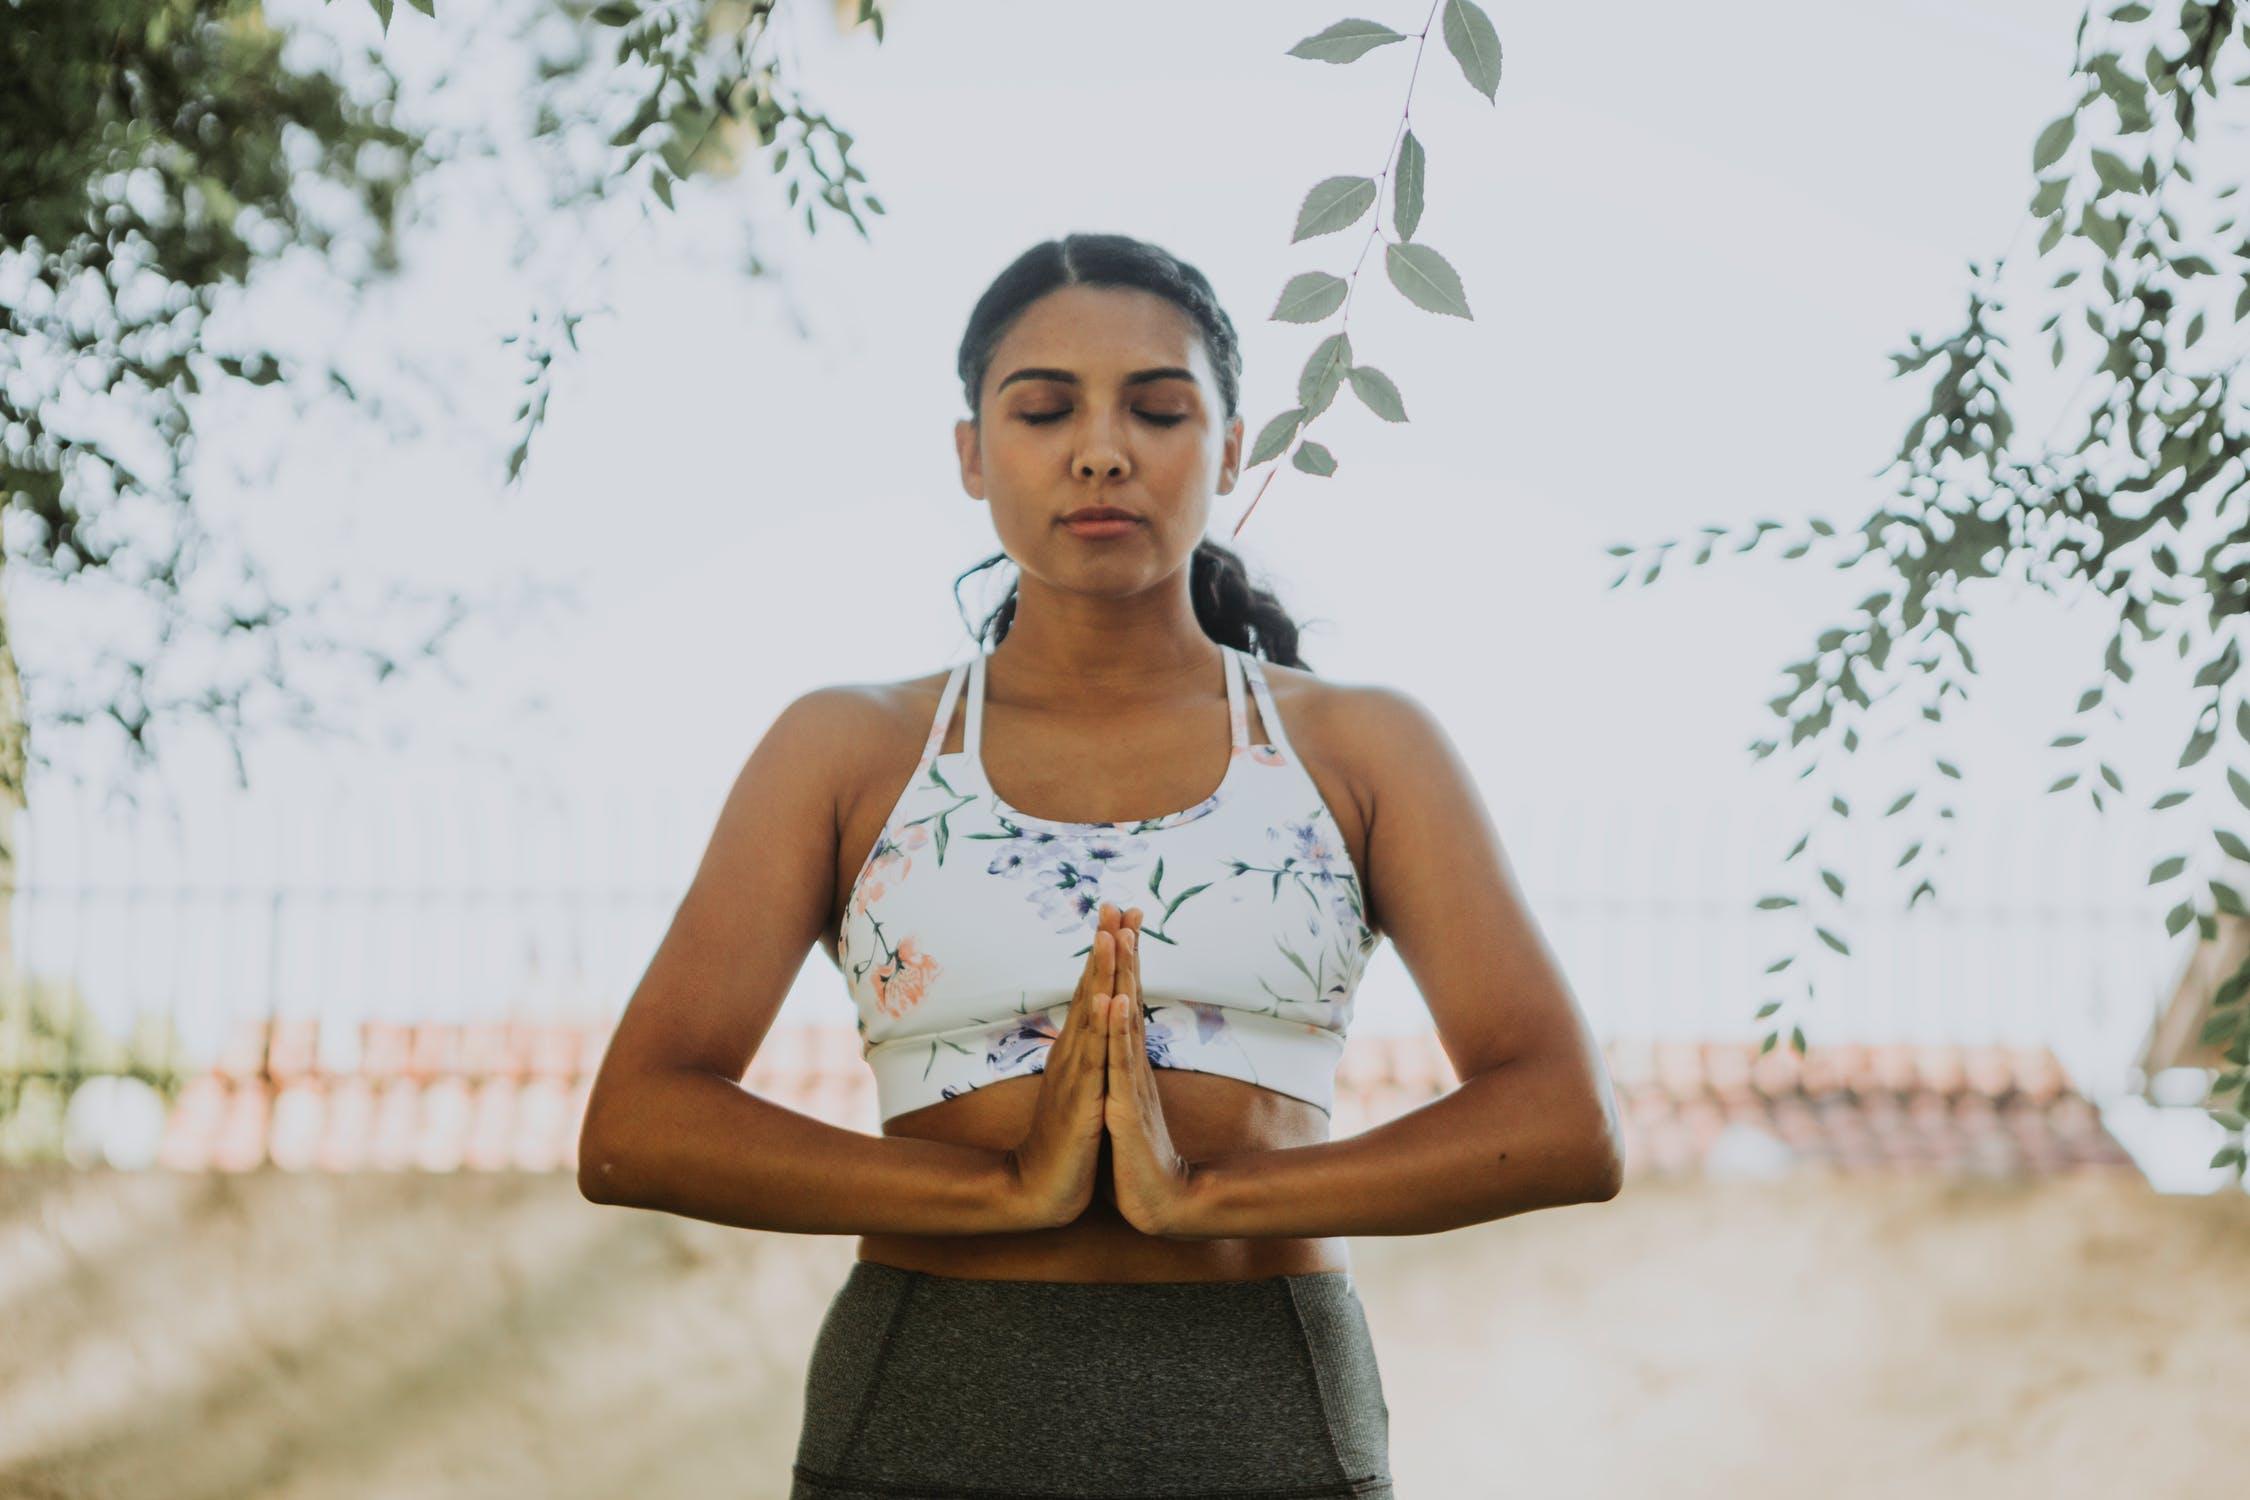 astuces méditation quand on s'ennuie